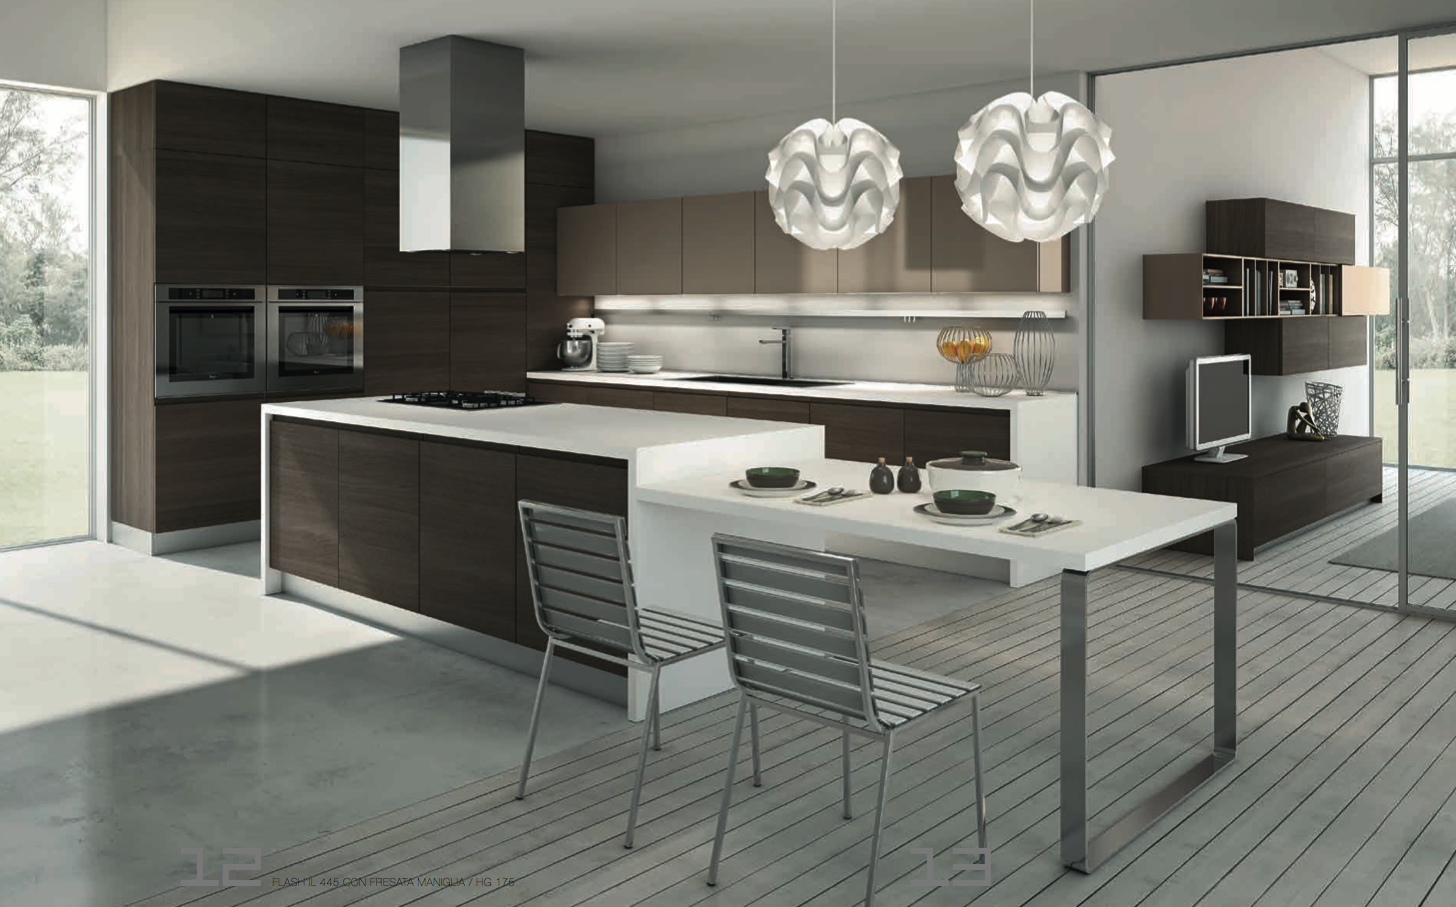 Cucine moderne for Cucina arreda